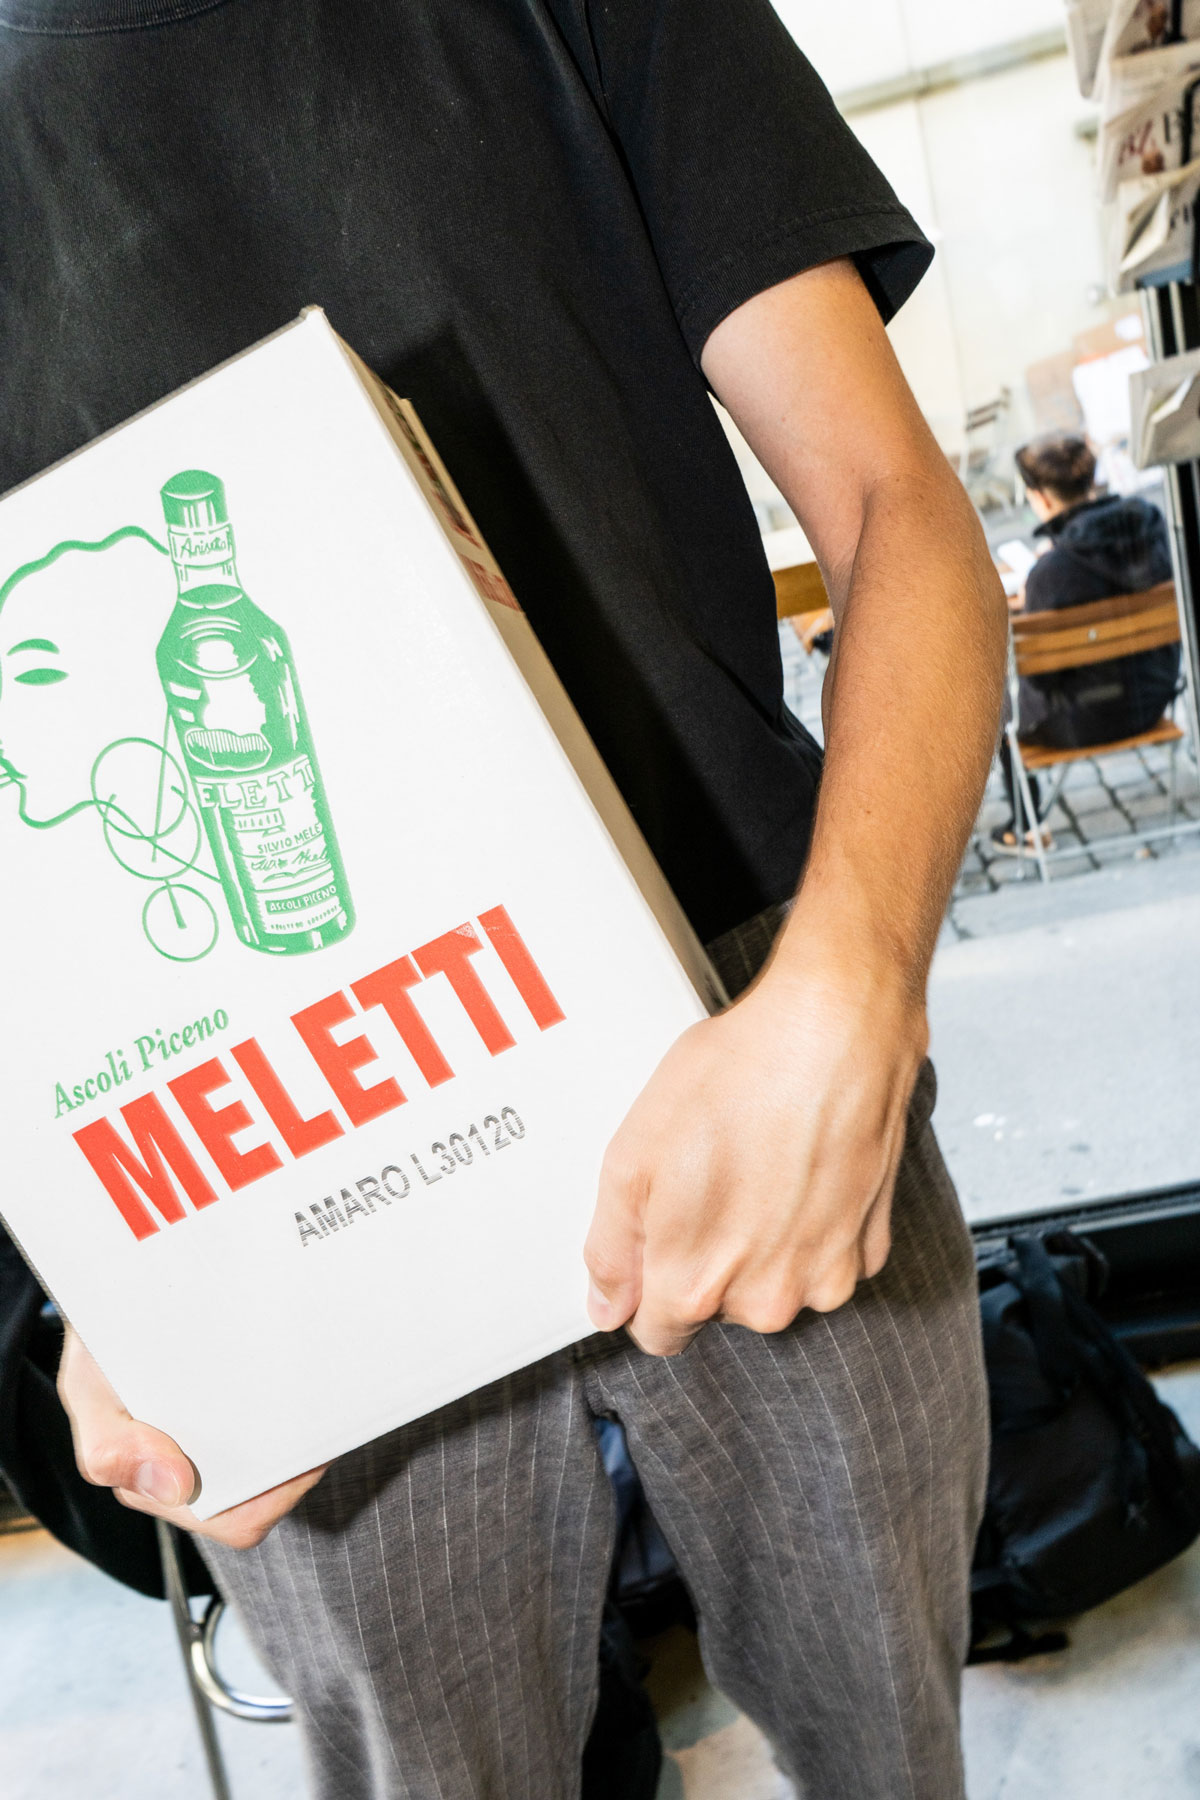 Versa Bar Bern Lieferant Meletti